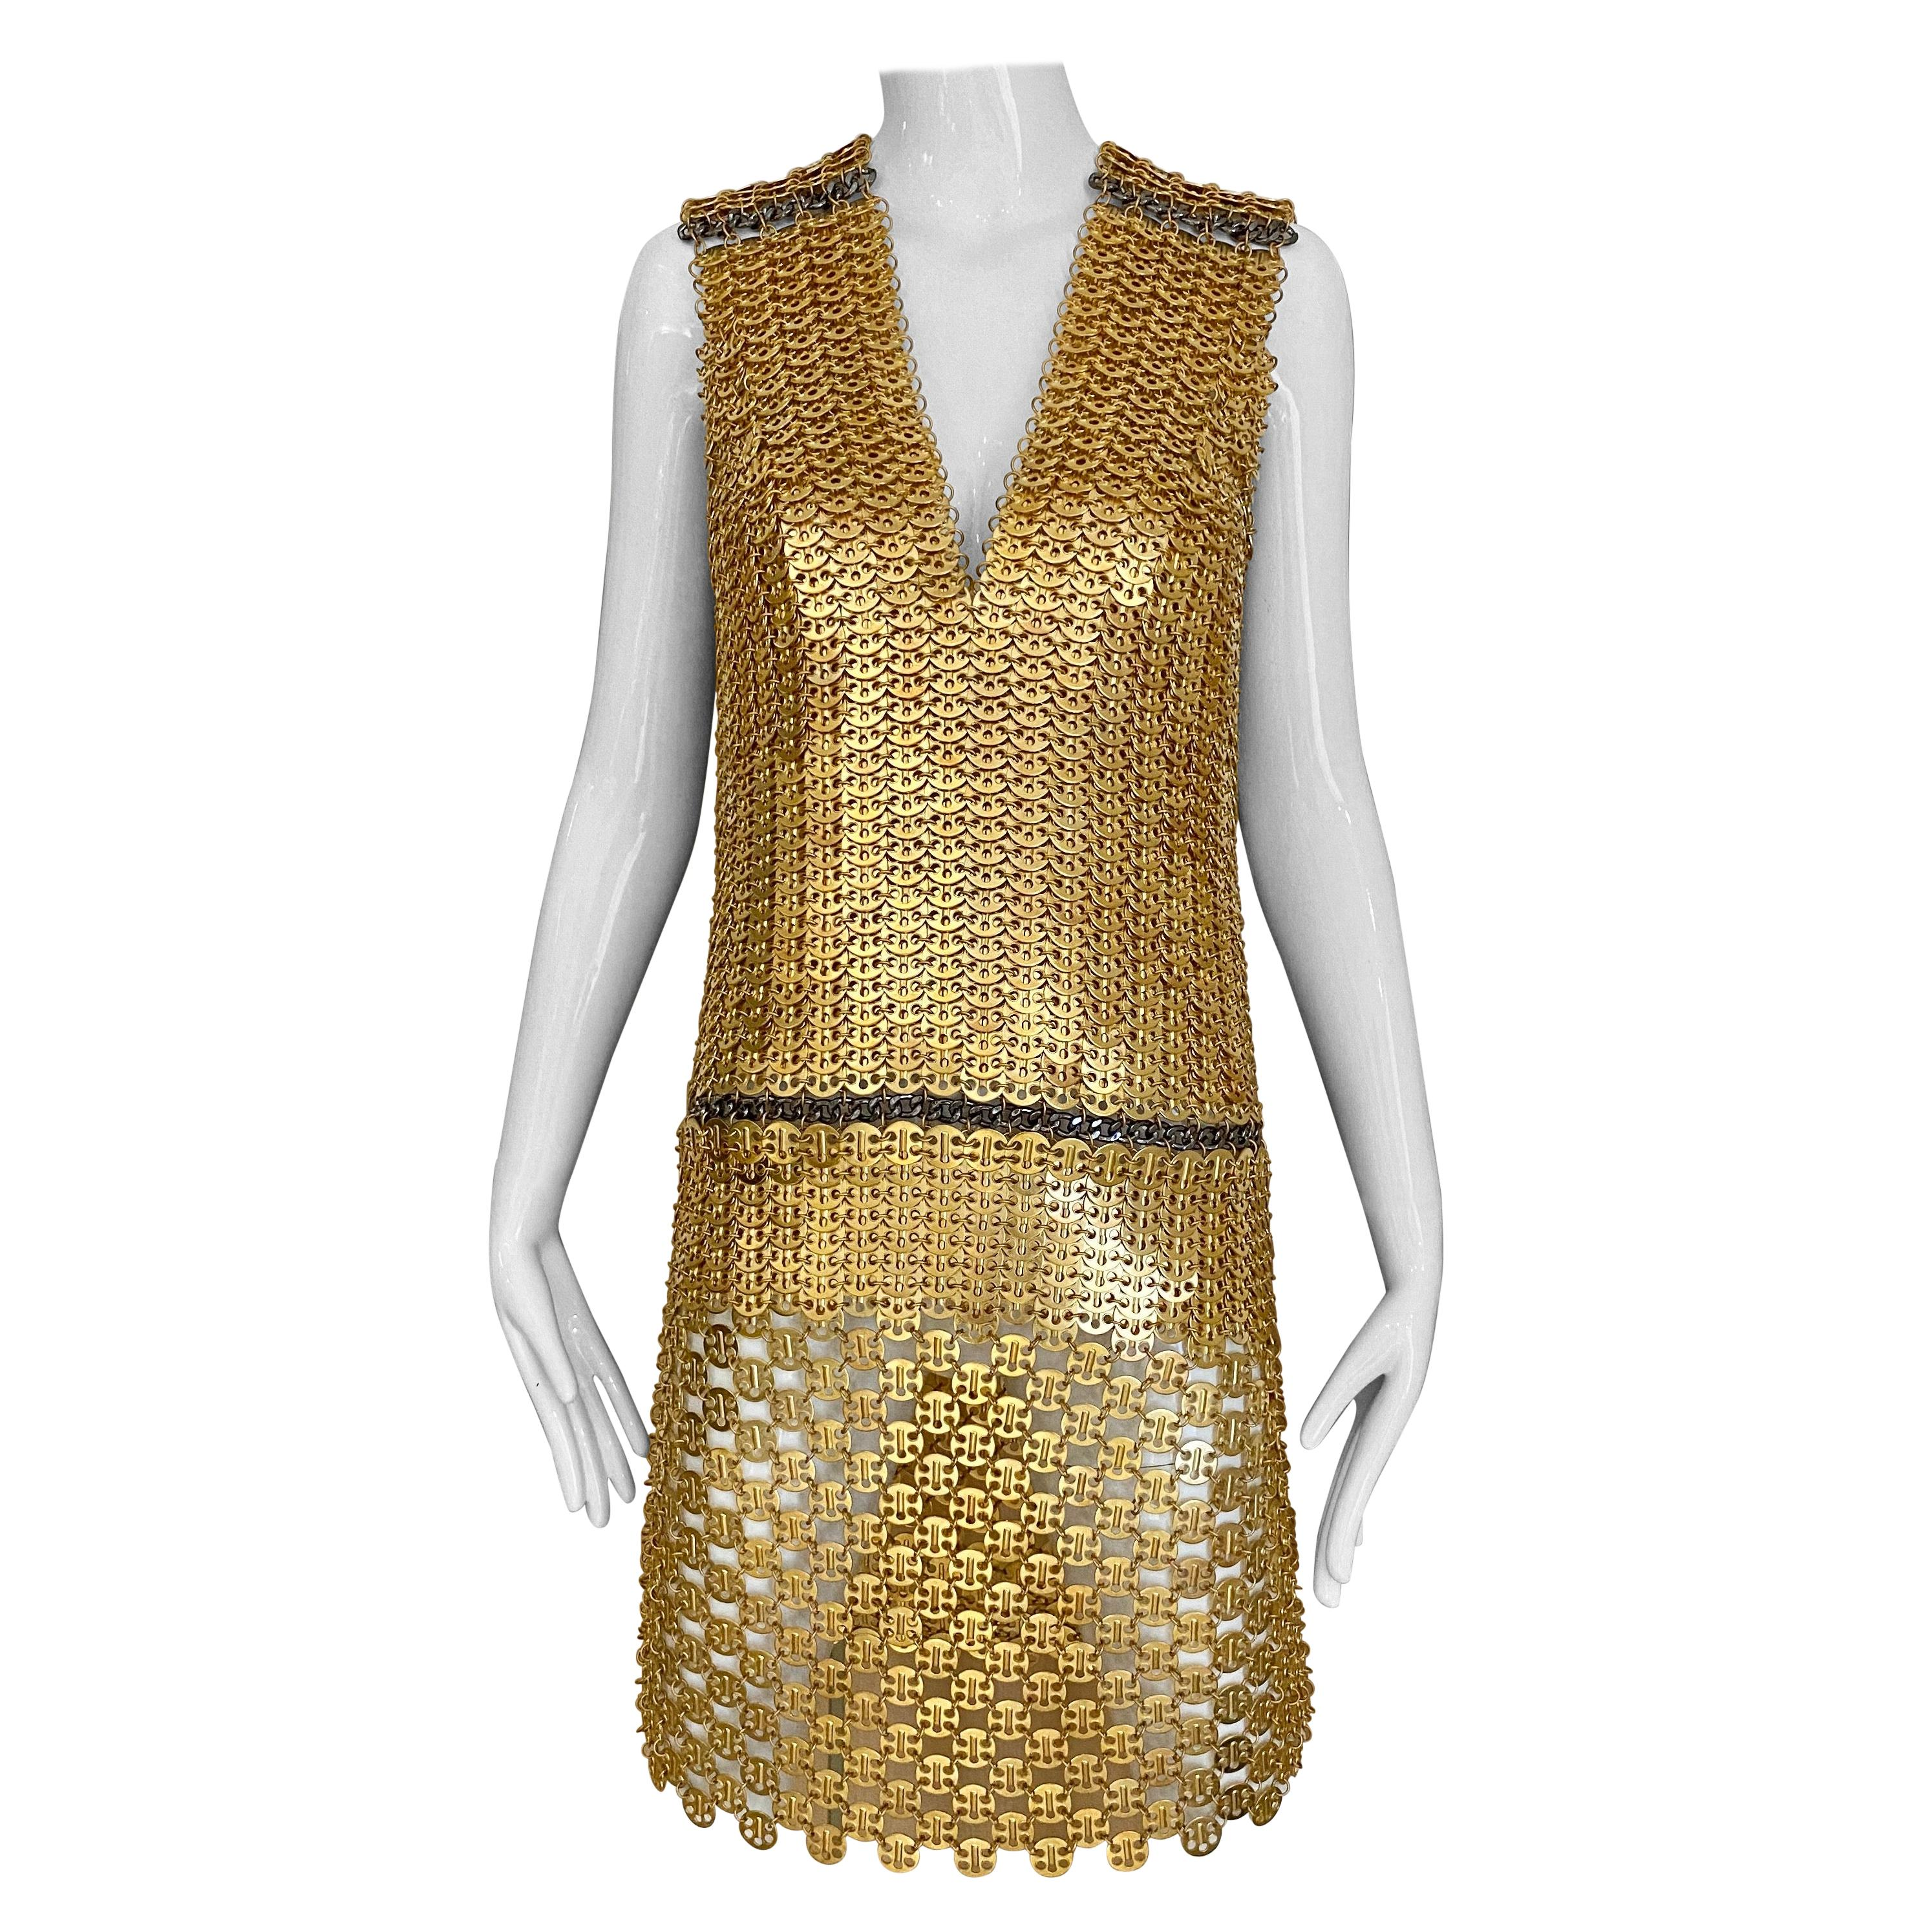 Paco Rabanne Gold Chain Cocktail Dress